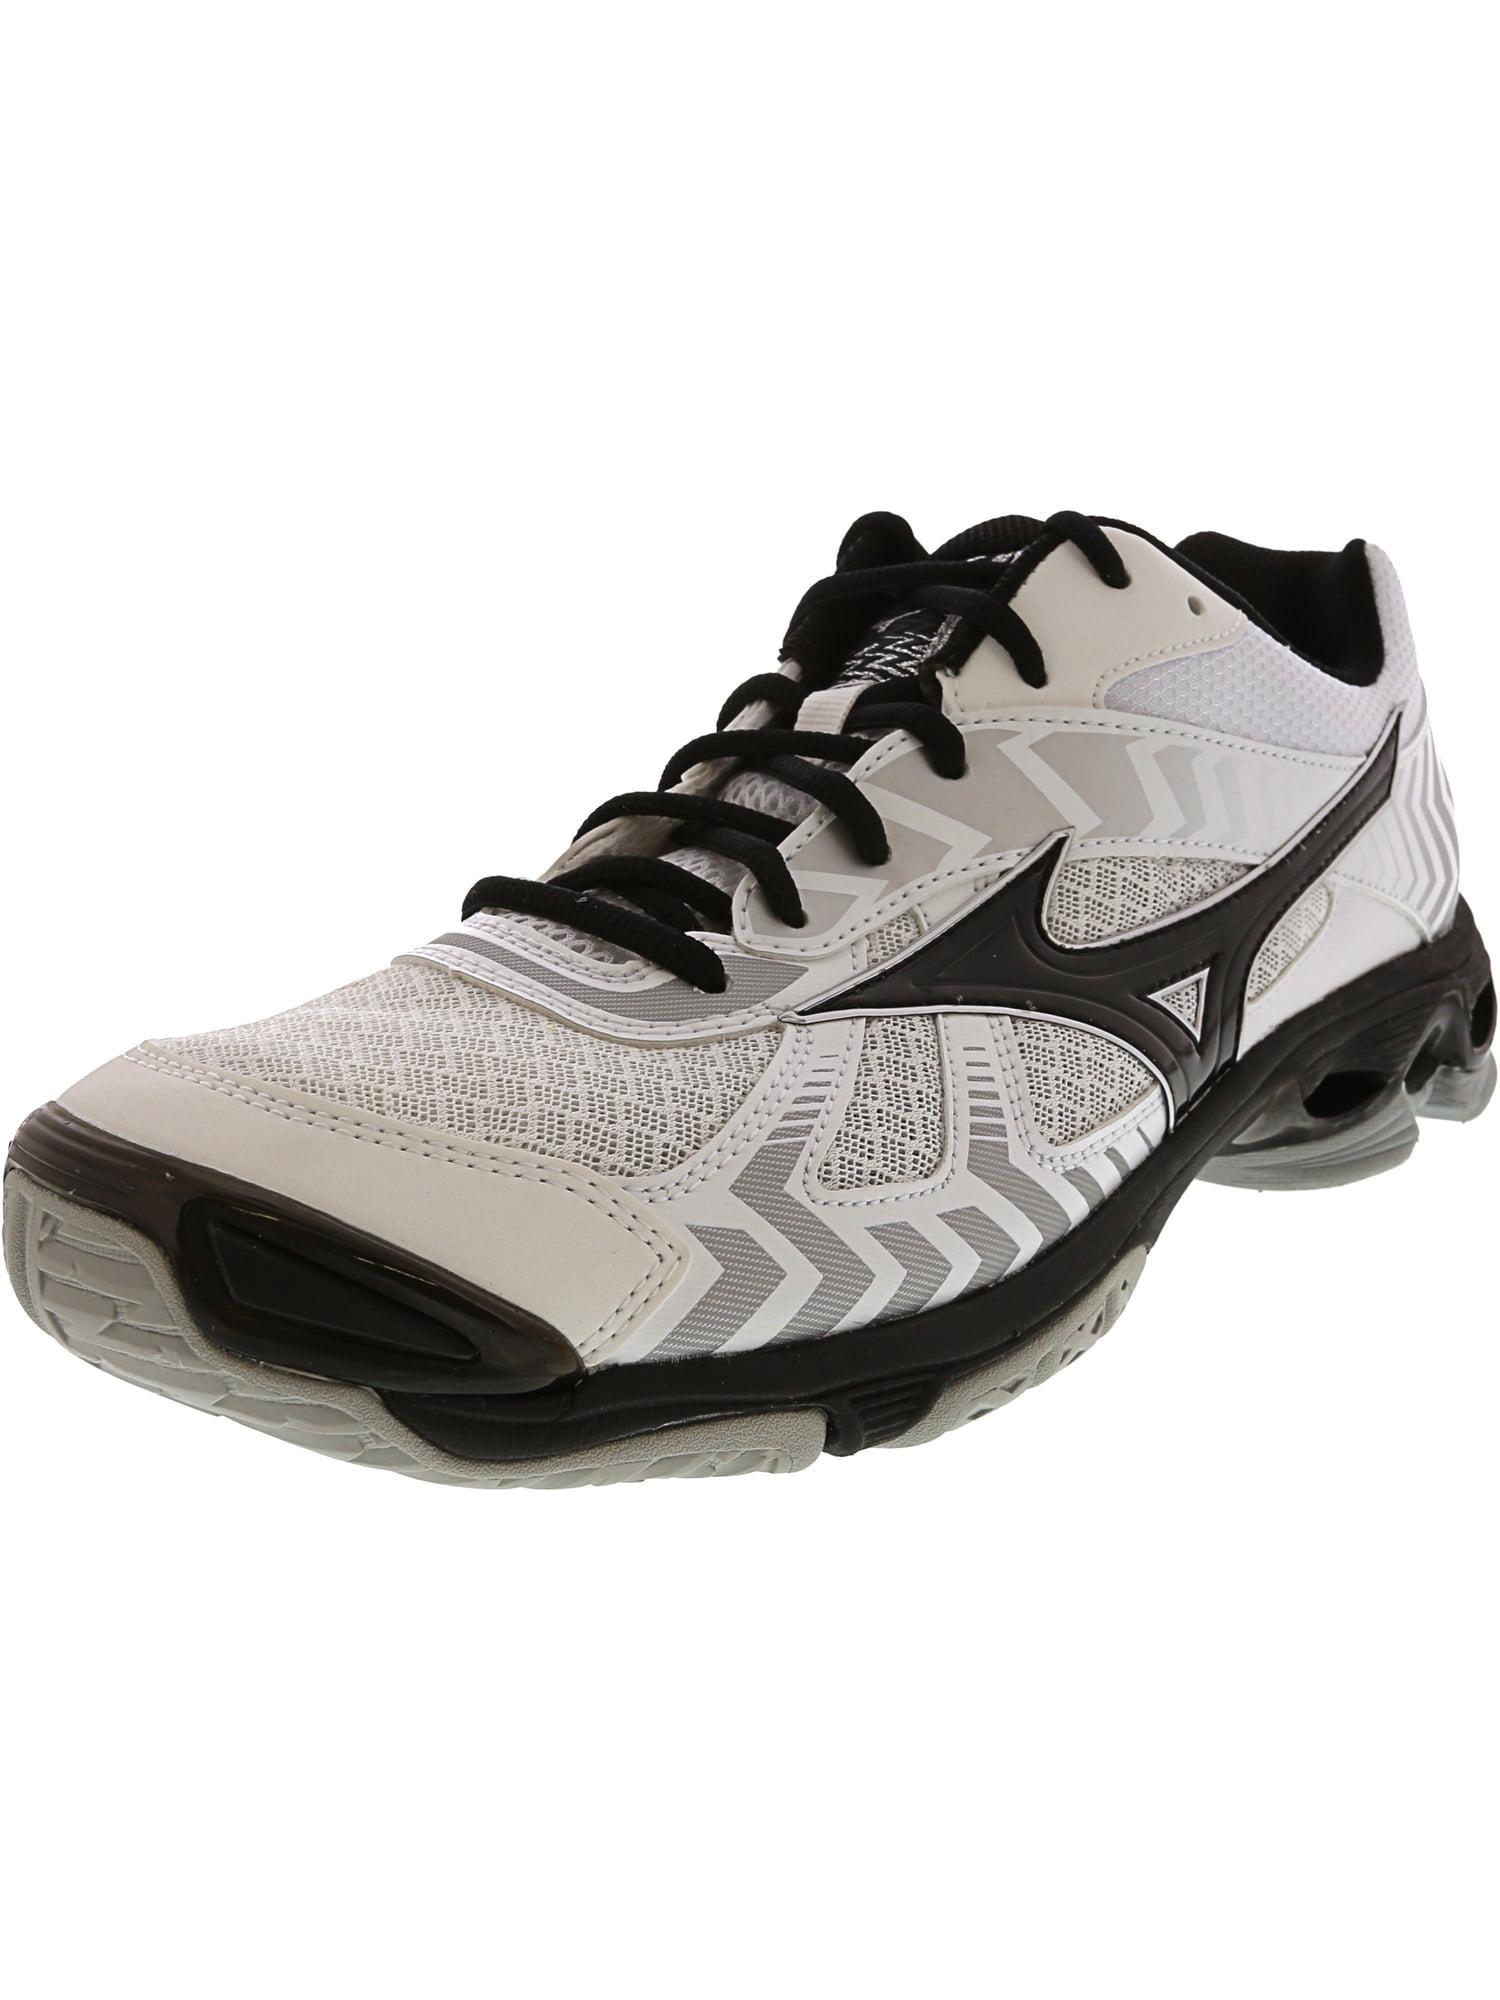 Mizuno Men's Wave Bolt 7 Volleyball Shoes 10.5M White